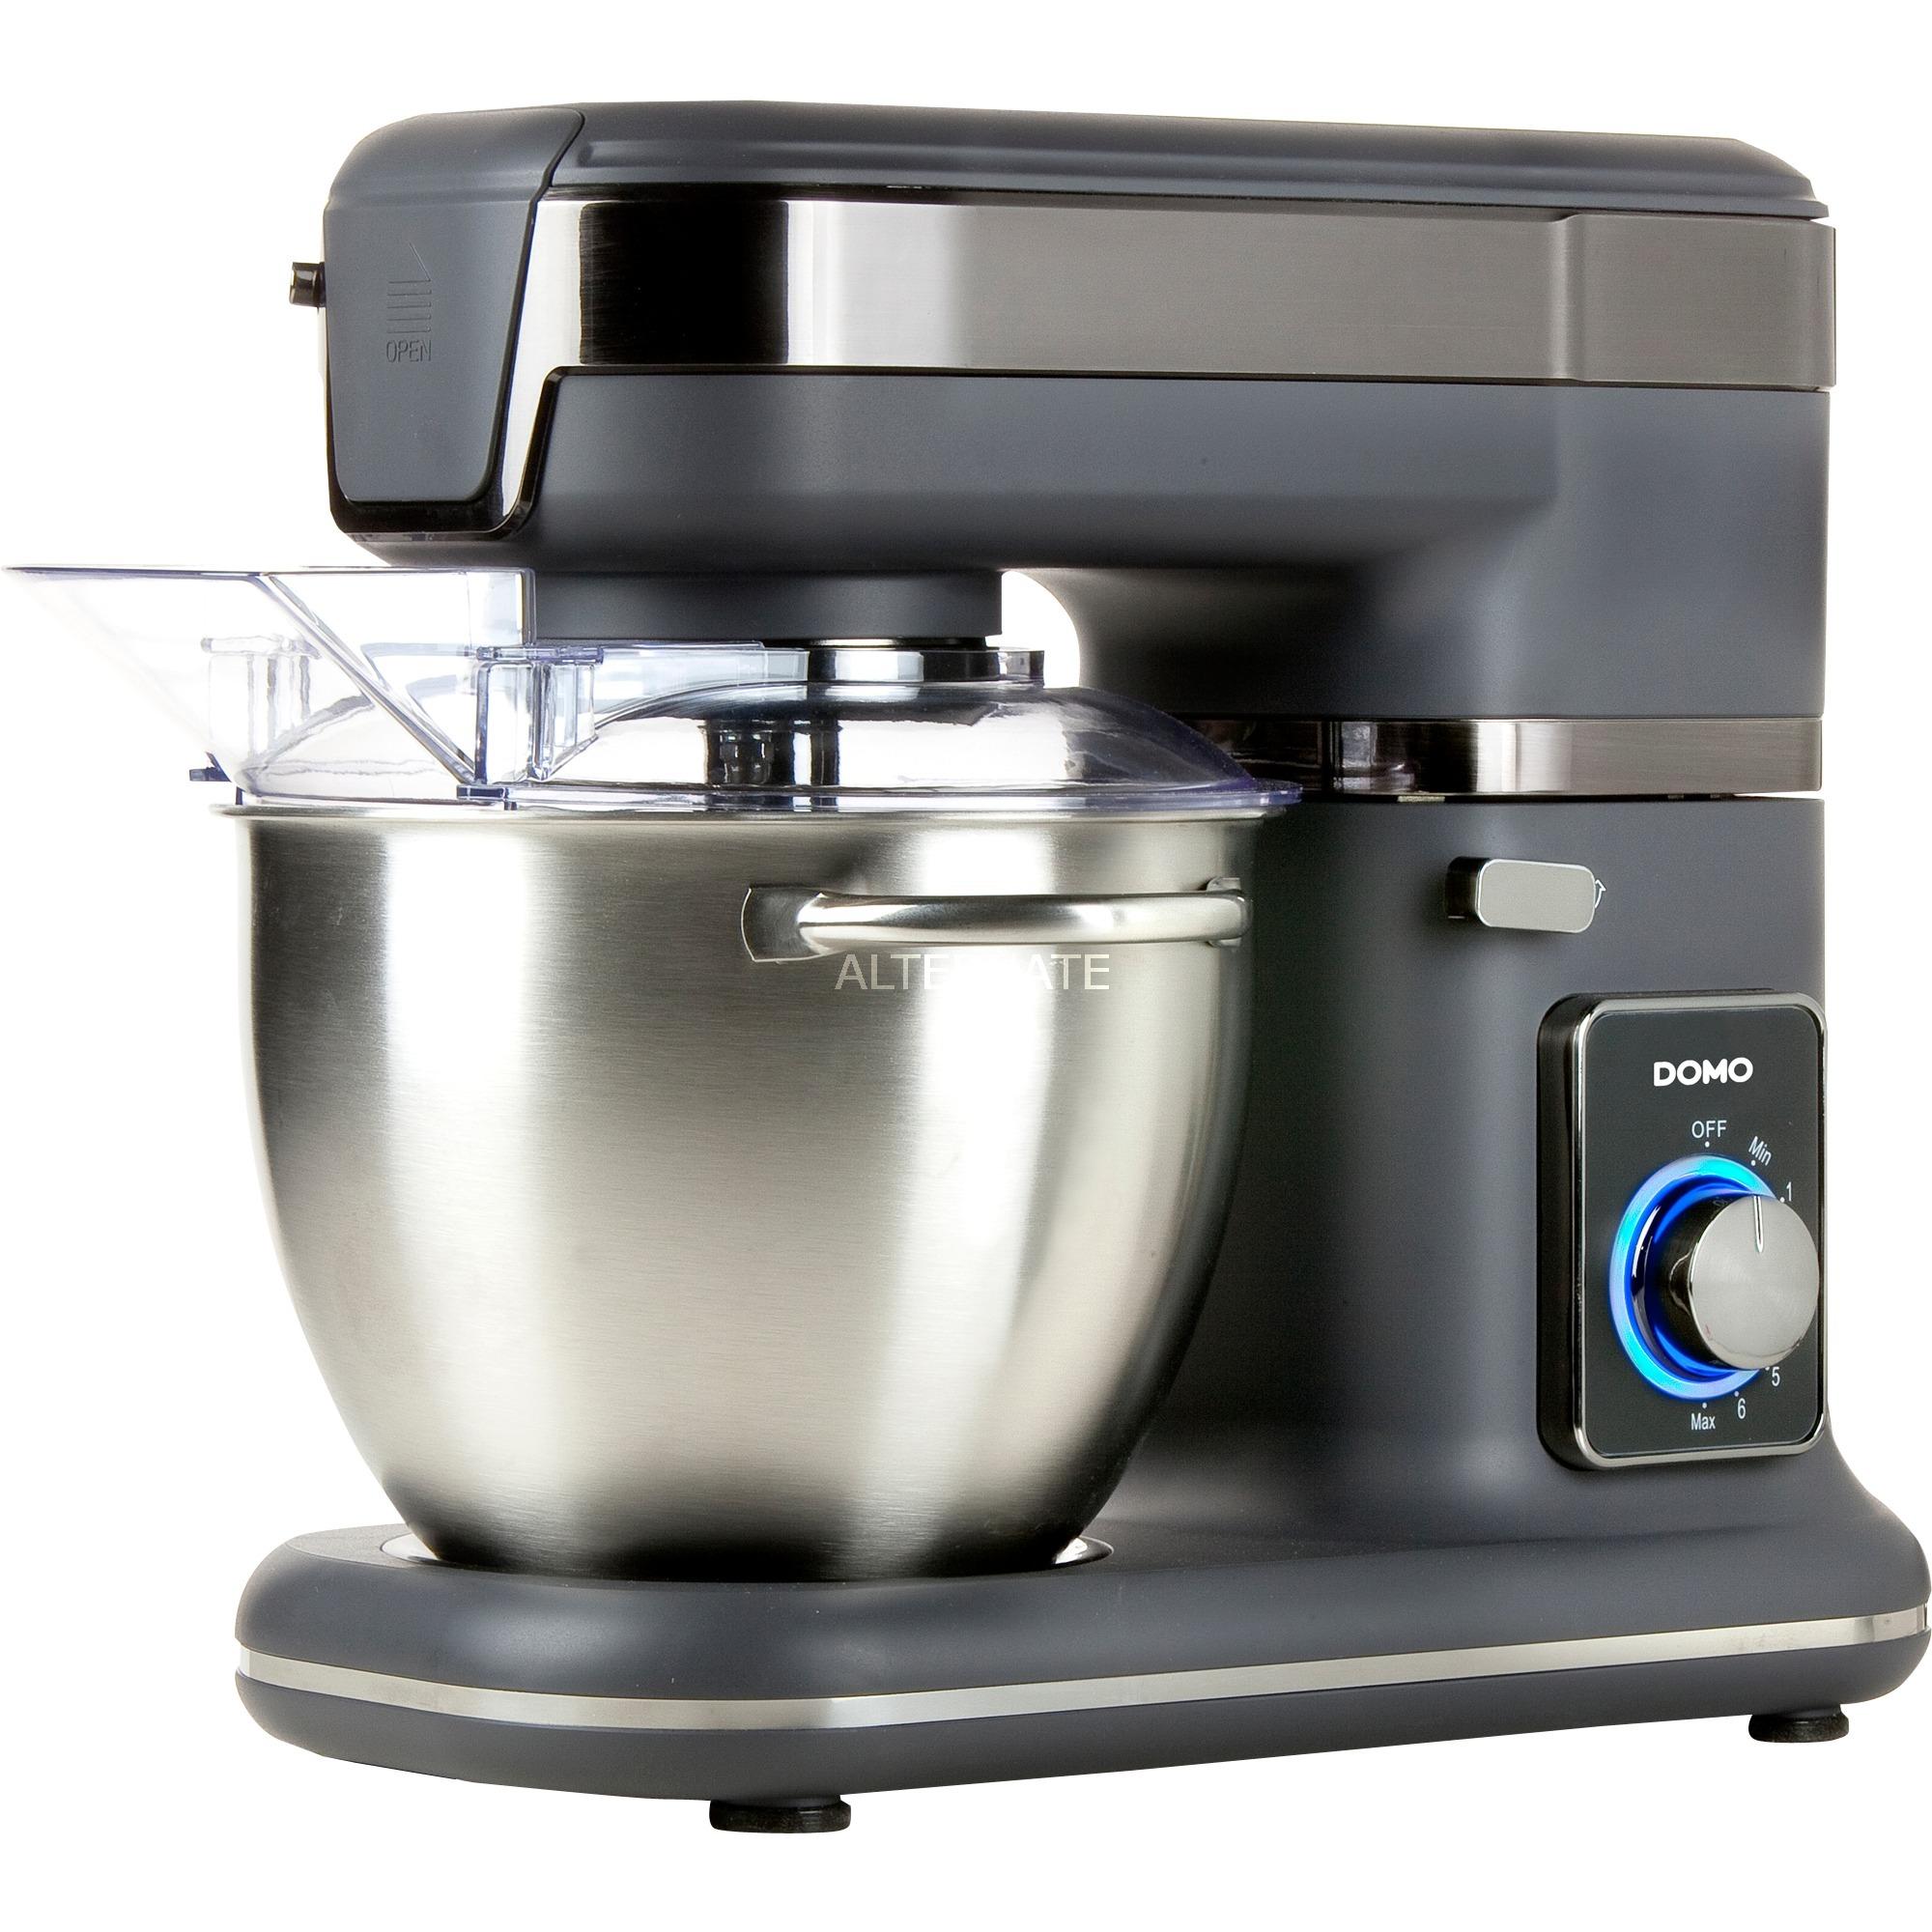 DO9070KR robot de cocina 4,5 L Acero inoxidable 1000 W